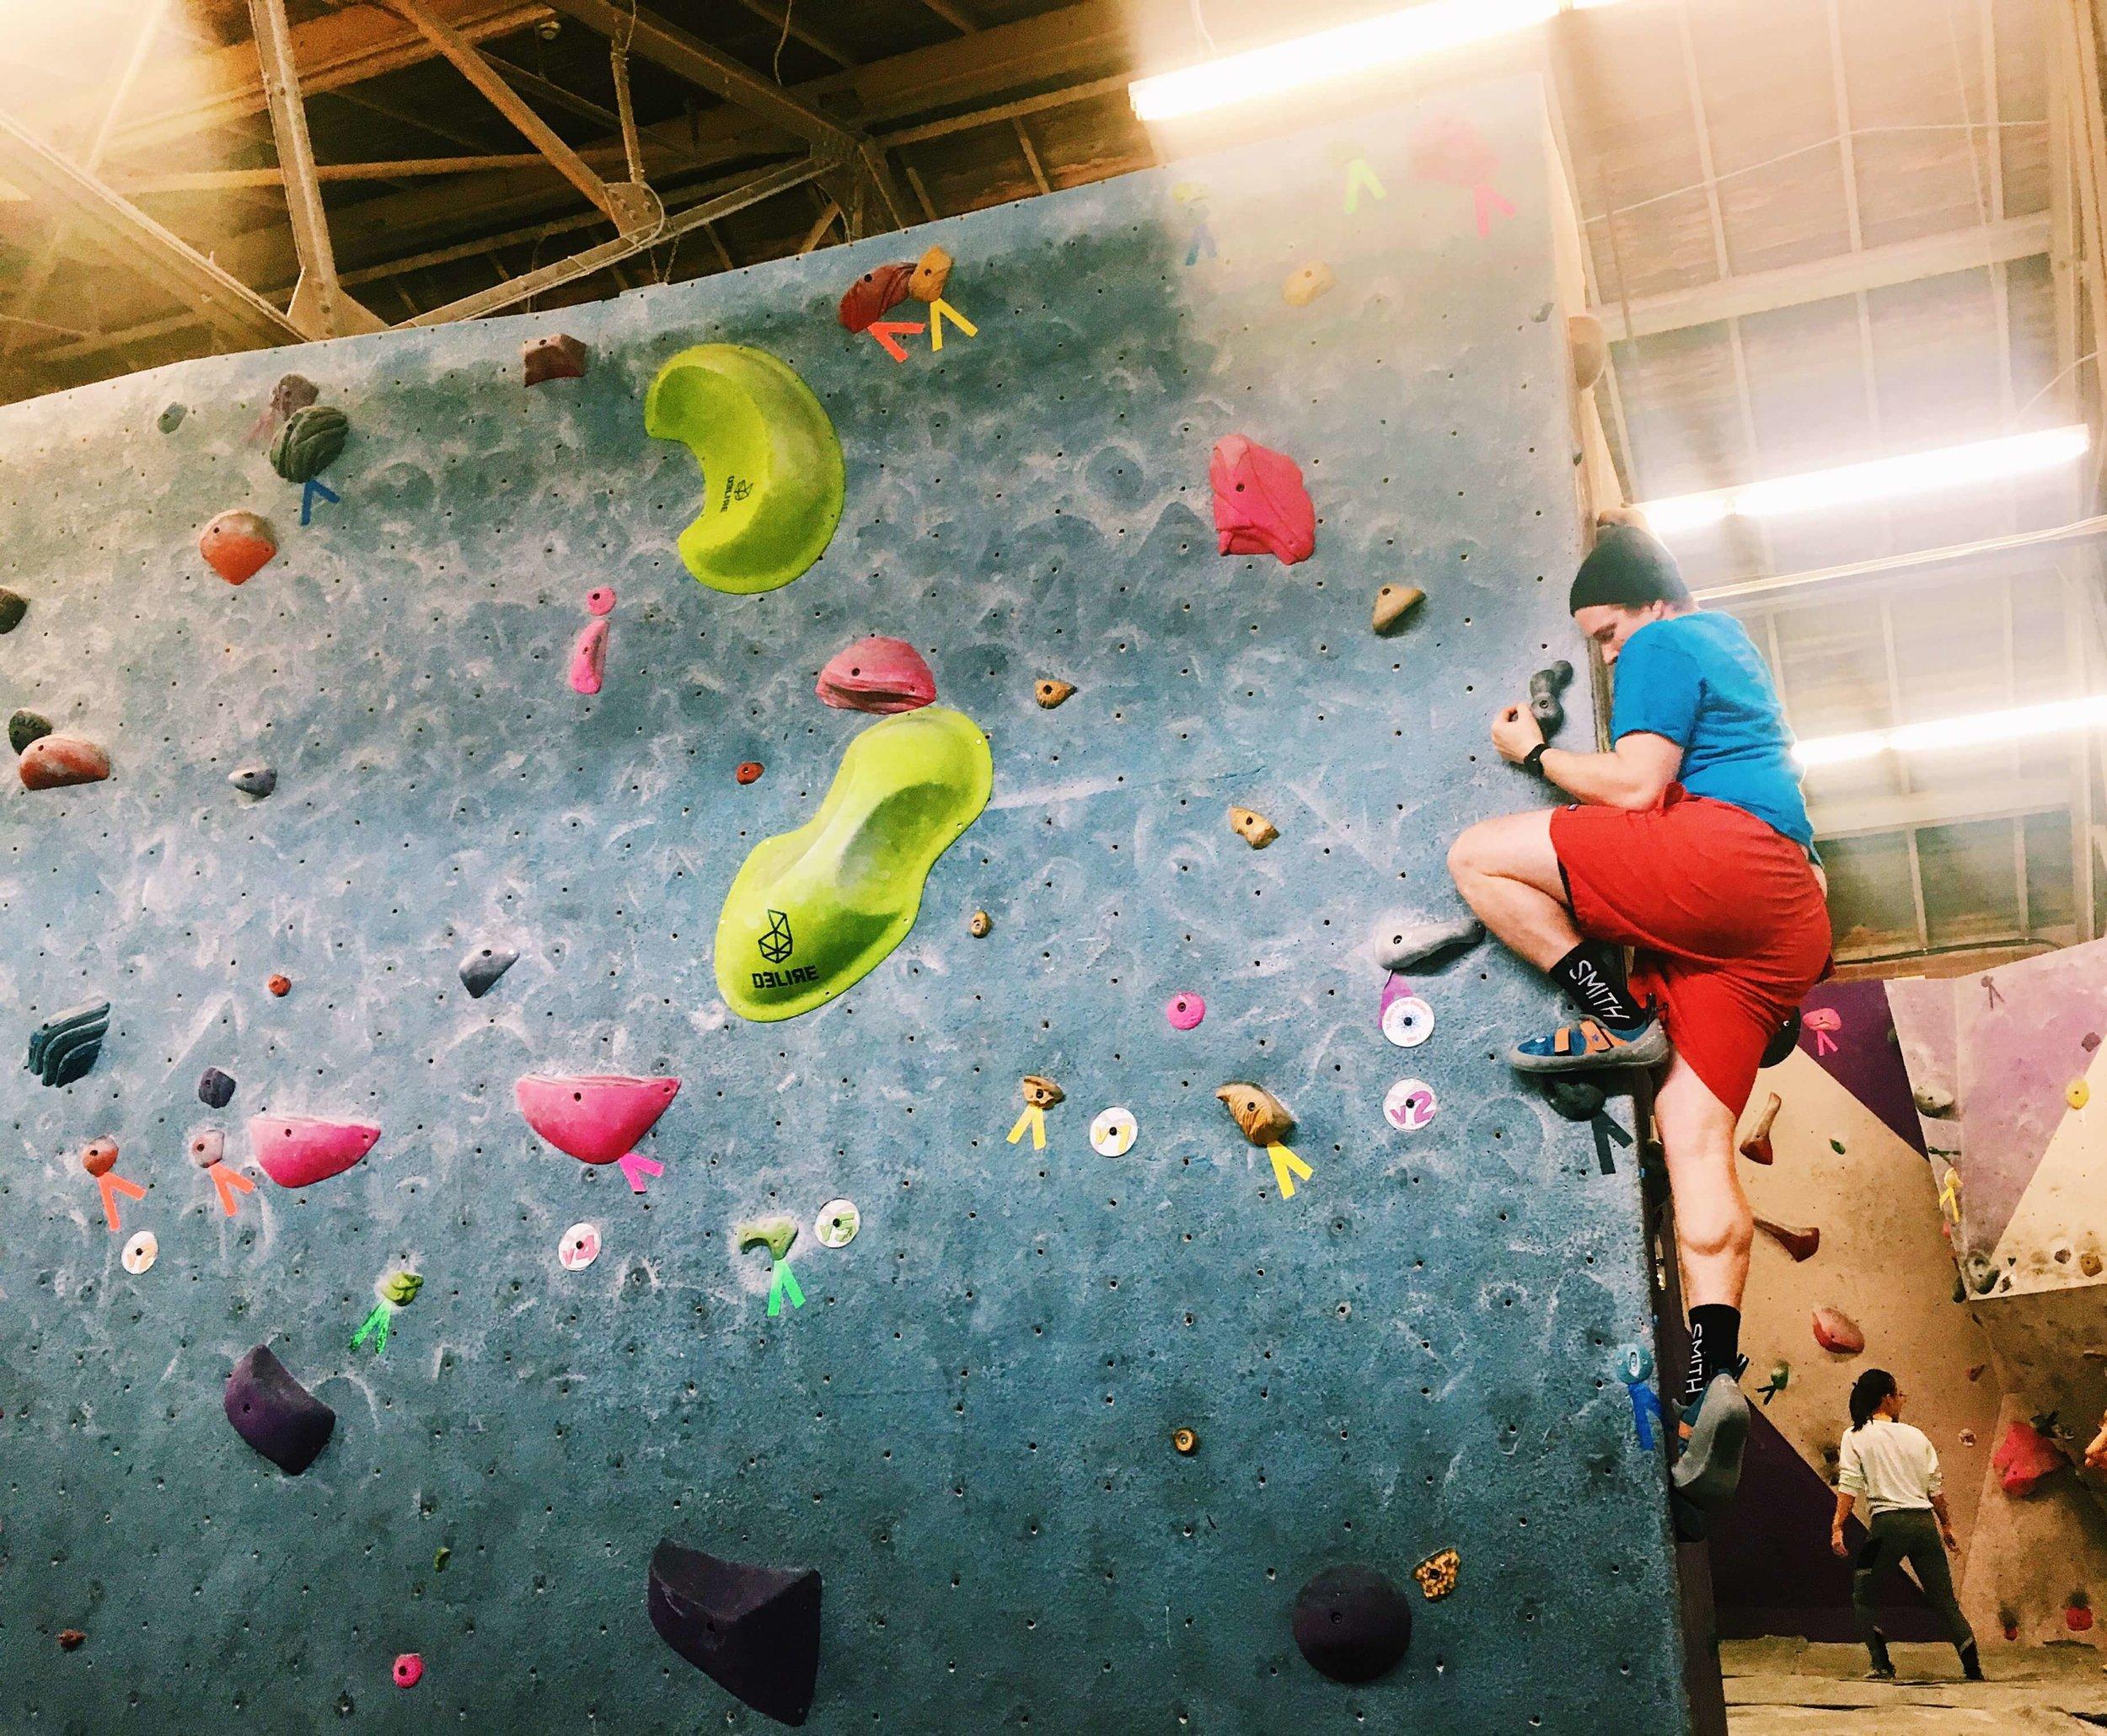 wildherness-adventure-sunday-rock-climbing.jpg